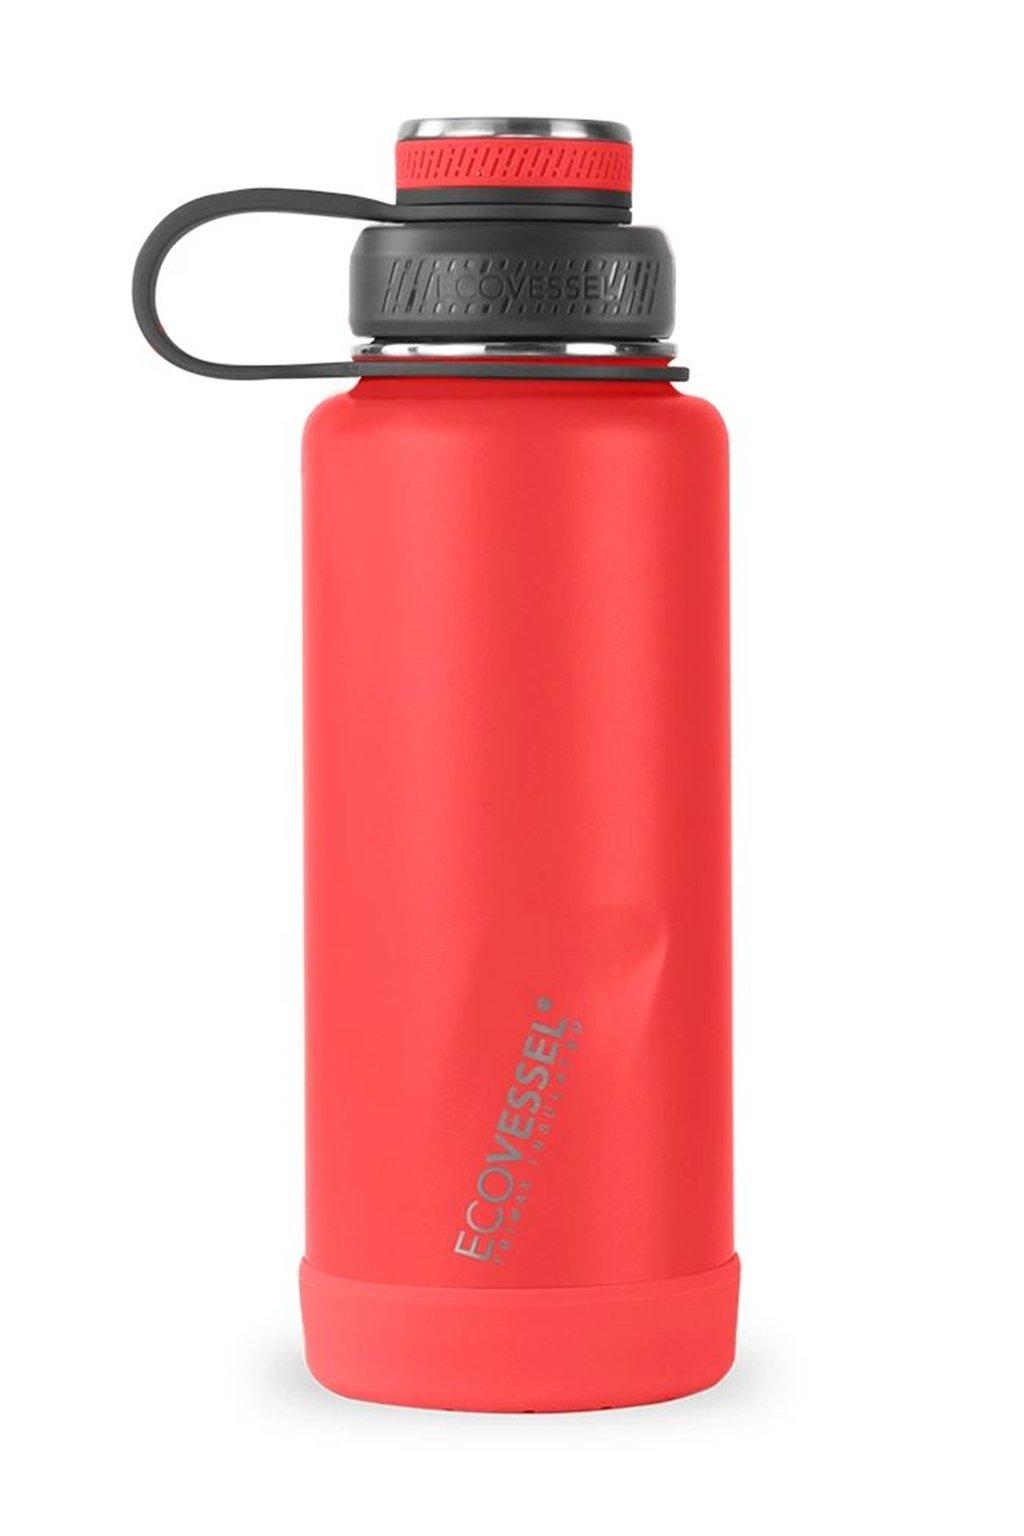 Termoska Eco Vessel 1 liter cervena